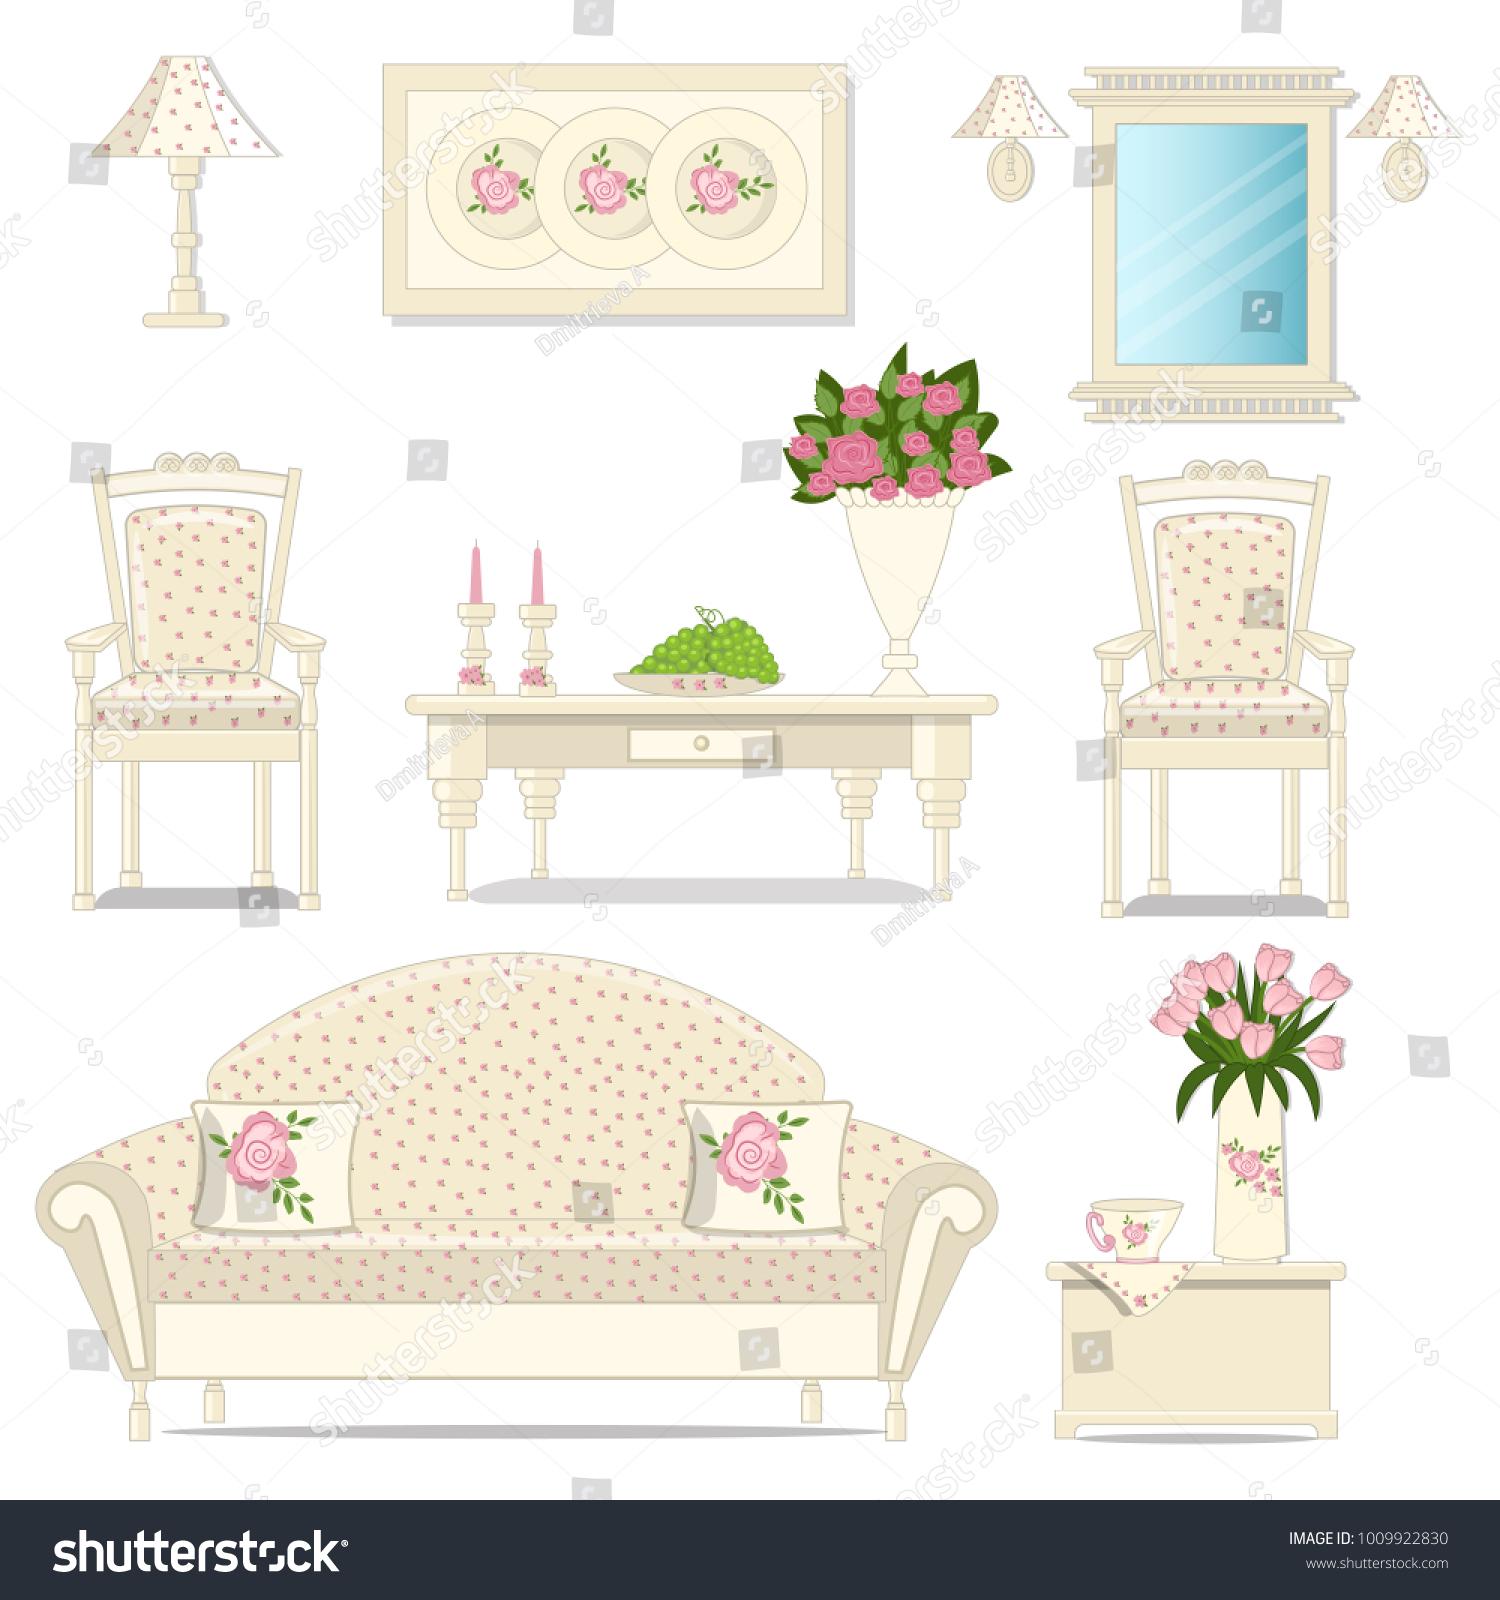 Interior Living Room Set Antique Furniture Stock Vector 1009922830 ...